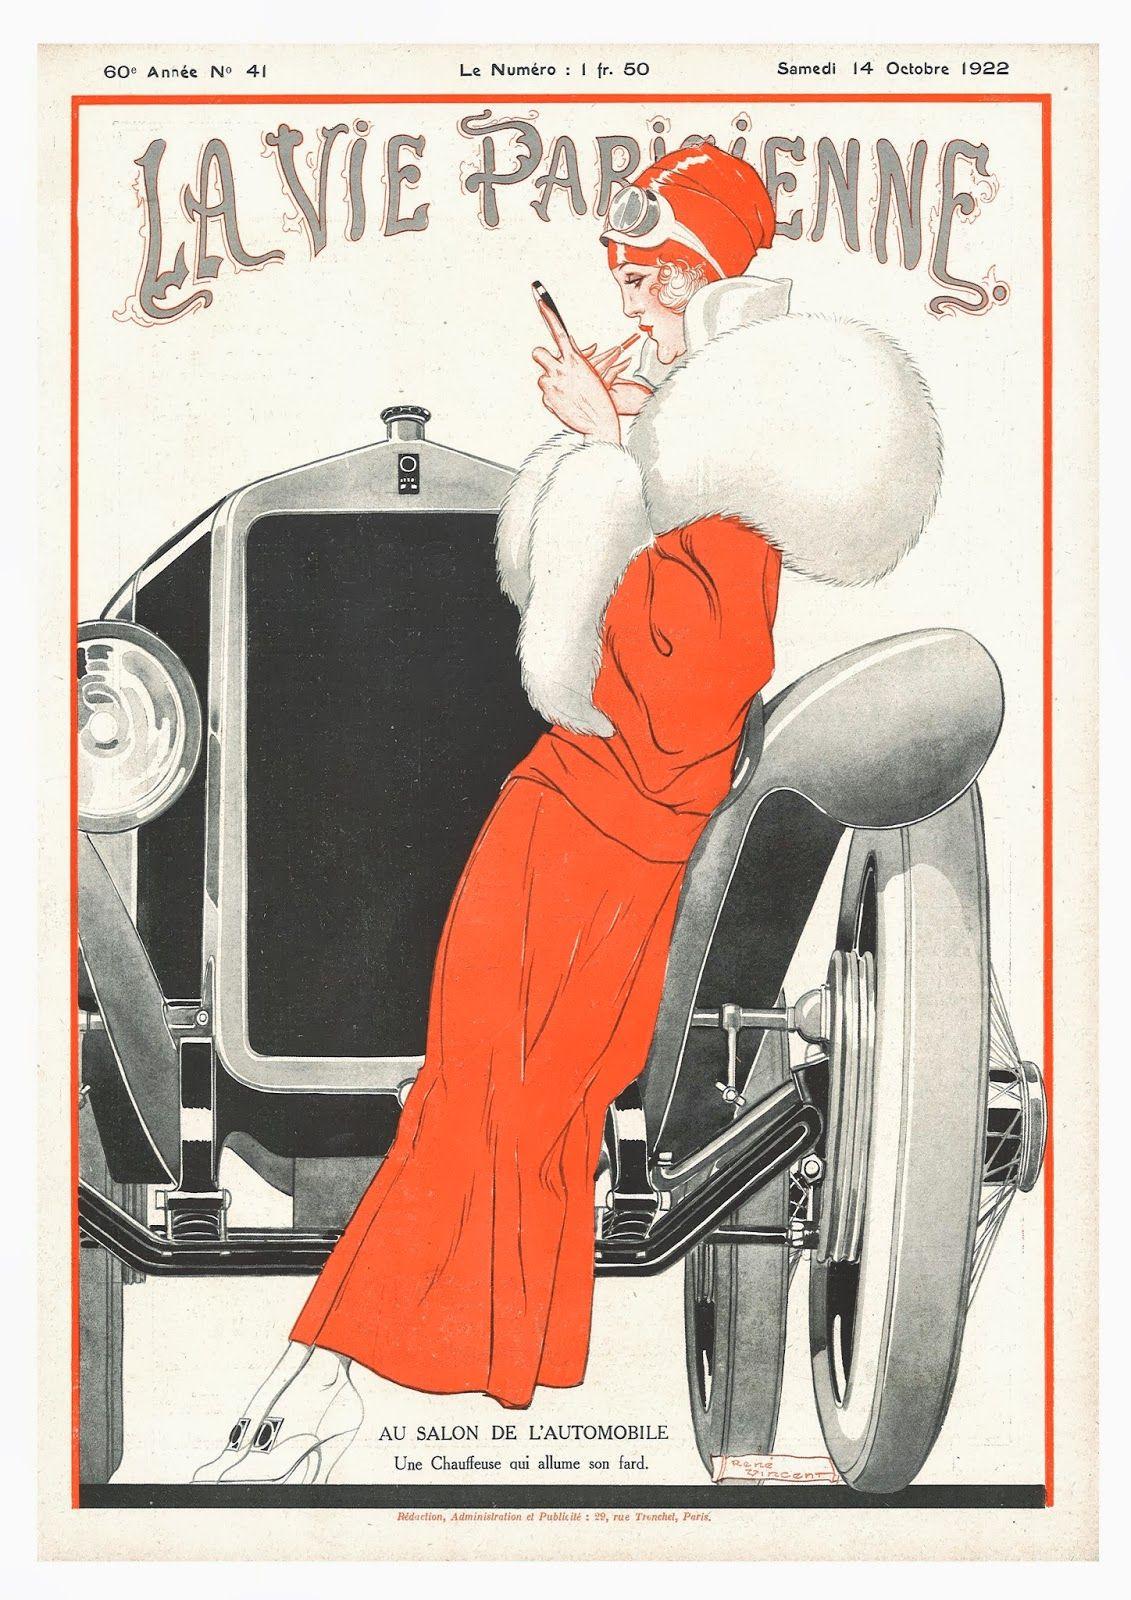 la vie parisienne deco girl with car magazine cover by georges leonnec 14th vintage. Black Bedroom Furniture Sets. Home Design Ideas